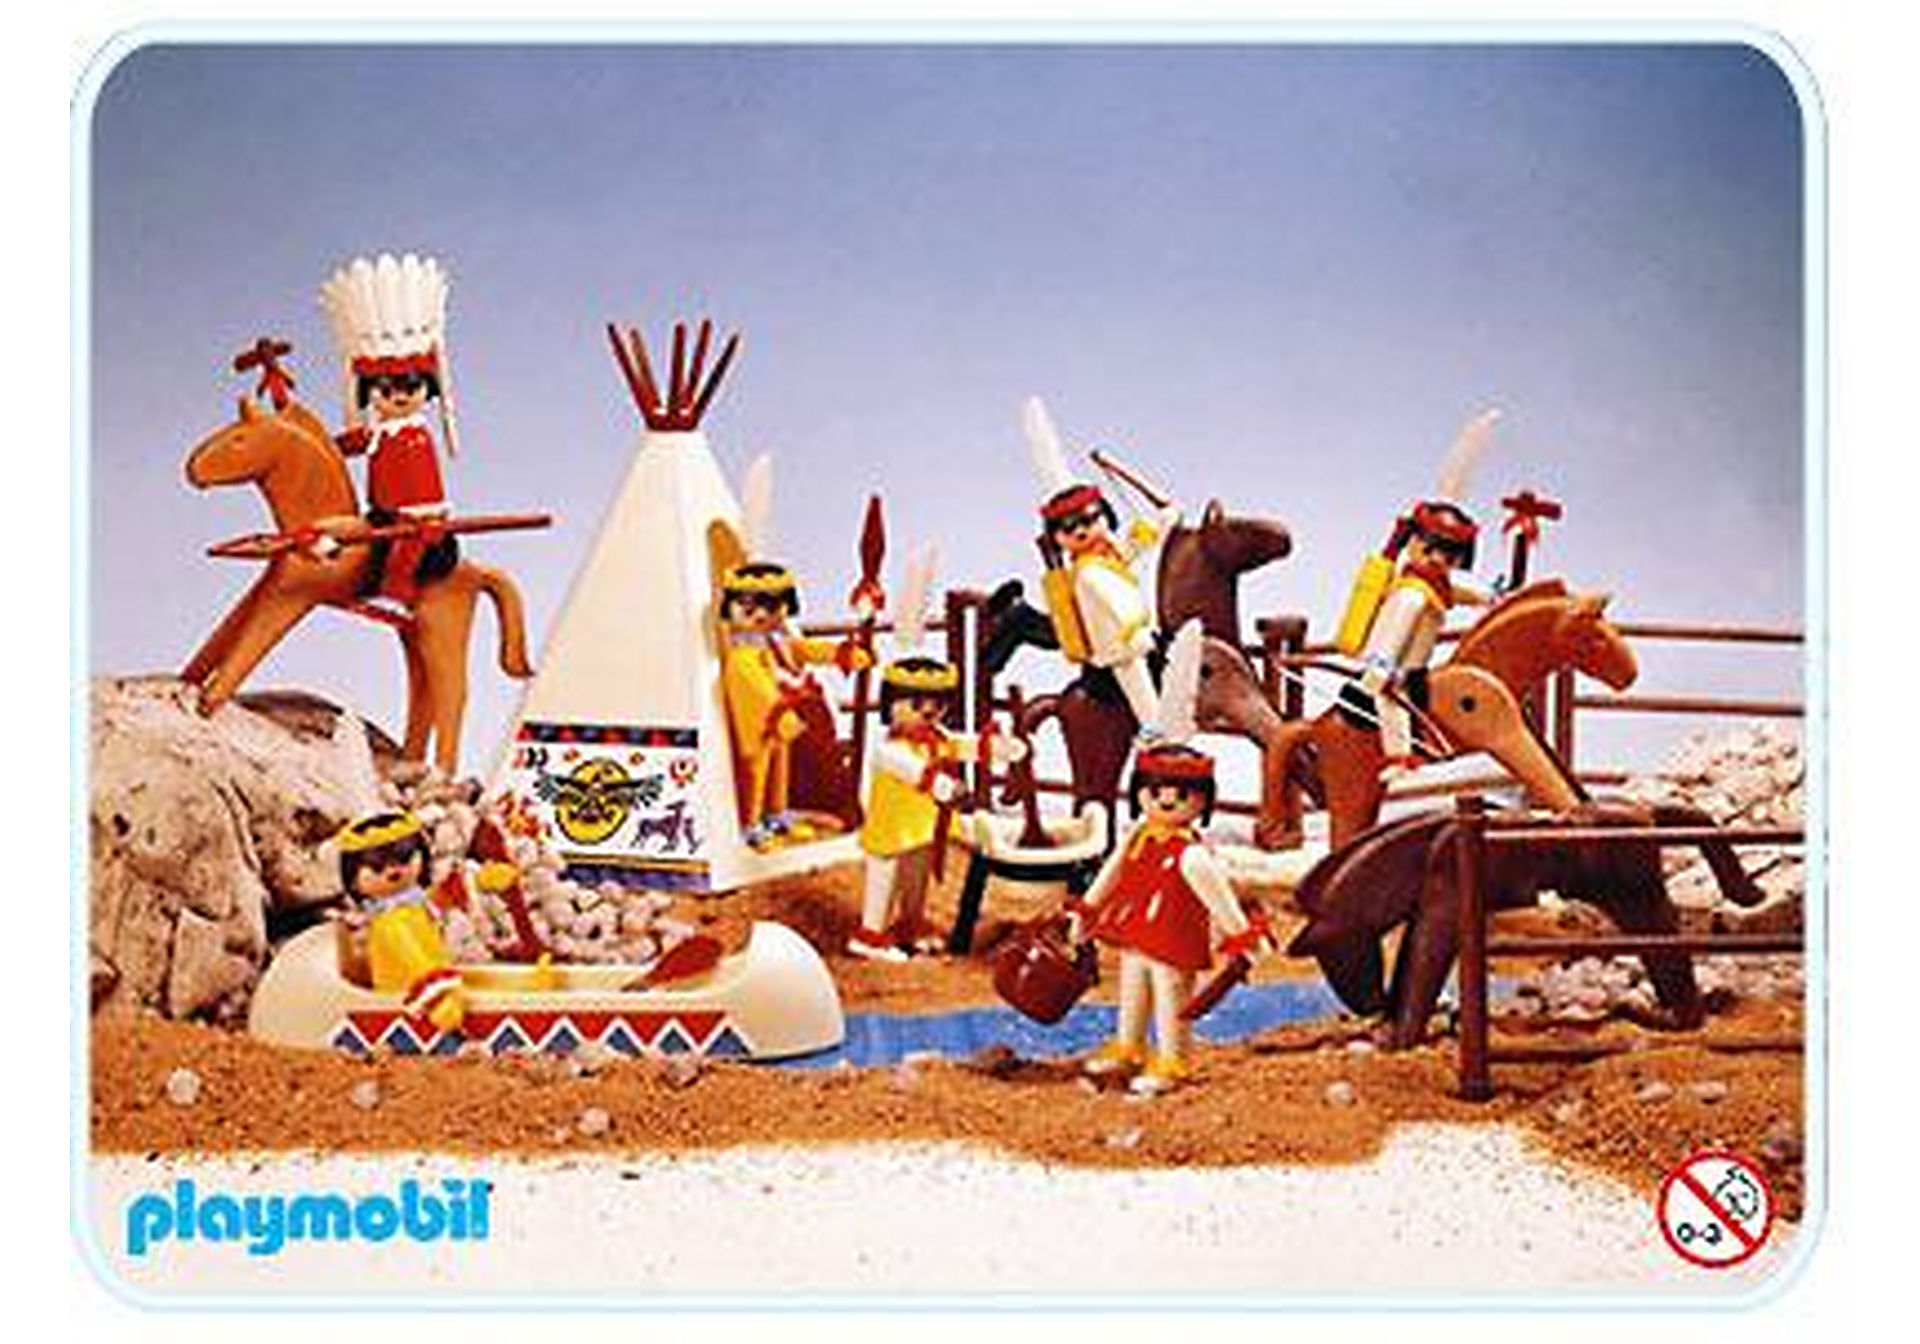 http://media.playmobil.com/i/playmobil/3406-A_product_detail/Indianer-Superset